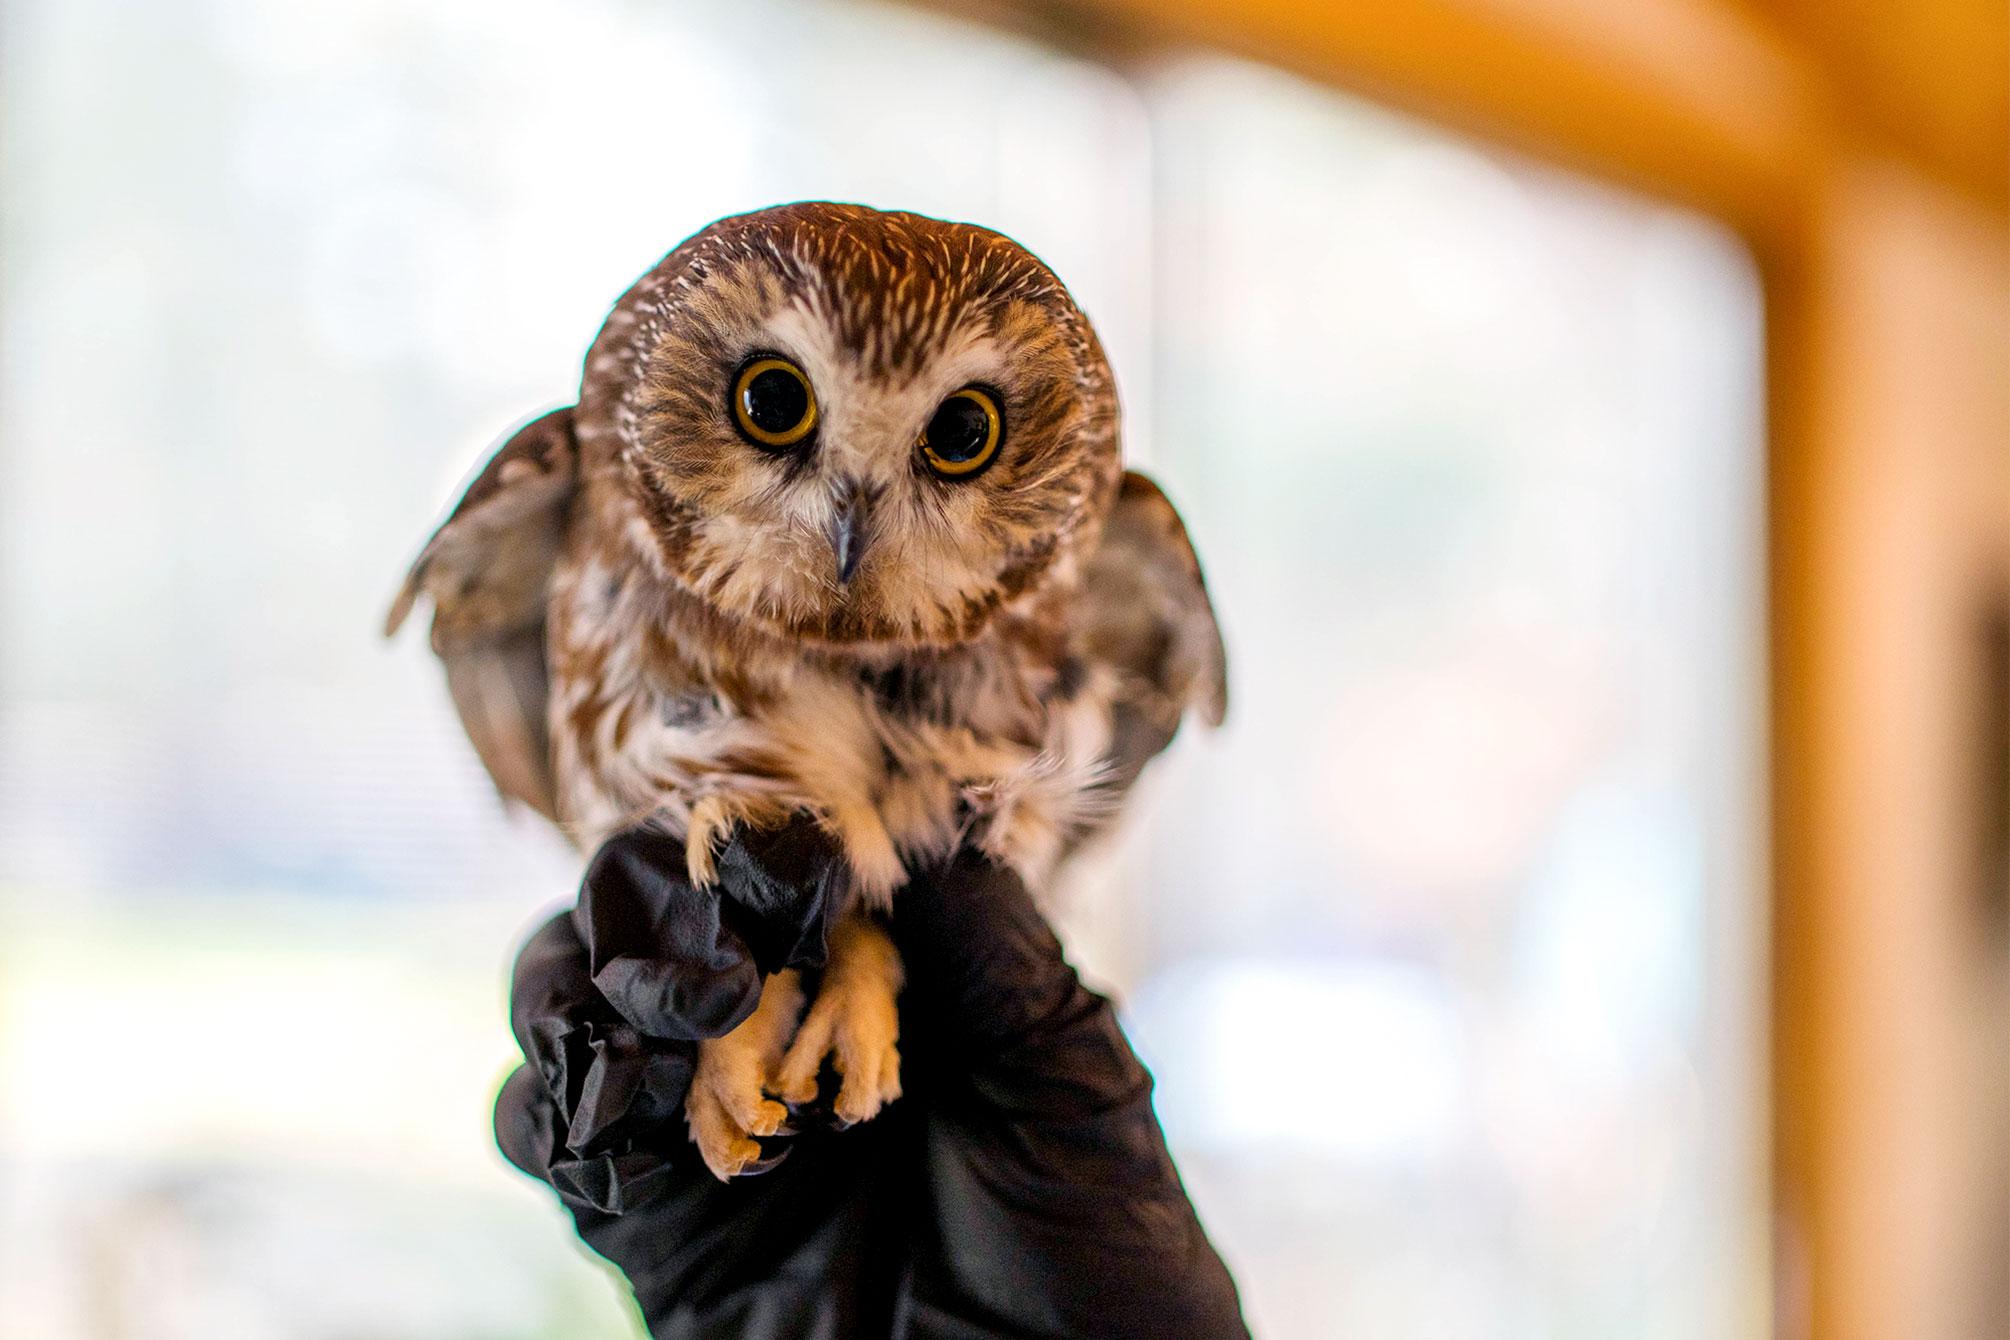 Rocky the Northern Saw-Whet Owl found in the Rockefeller Center Christmas Tree. Ravensbeard Wildlife Center